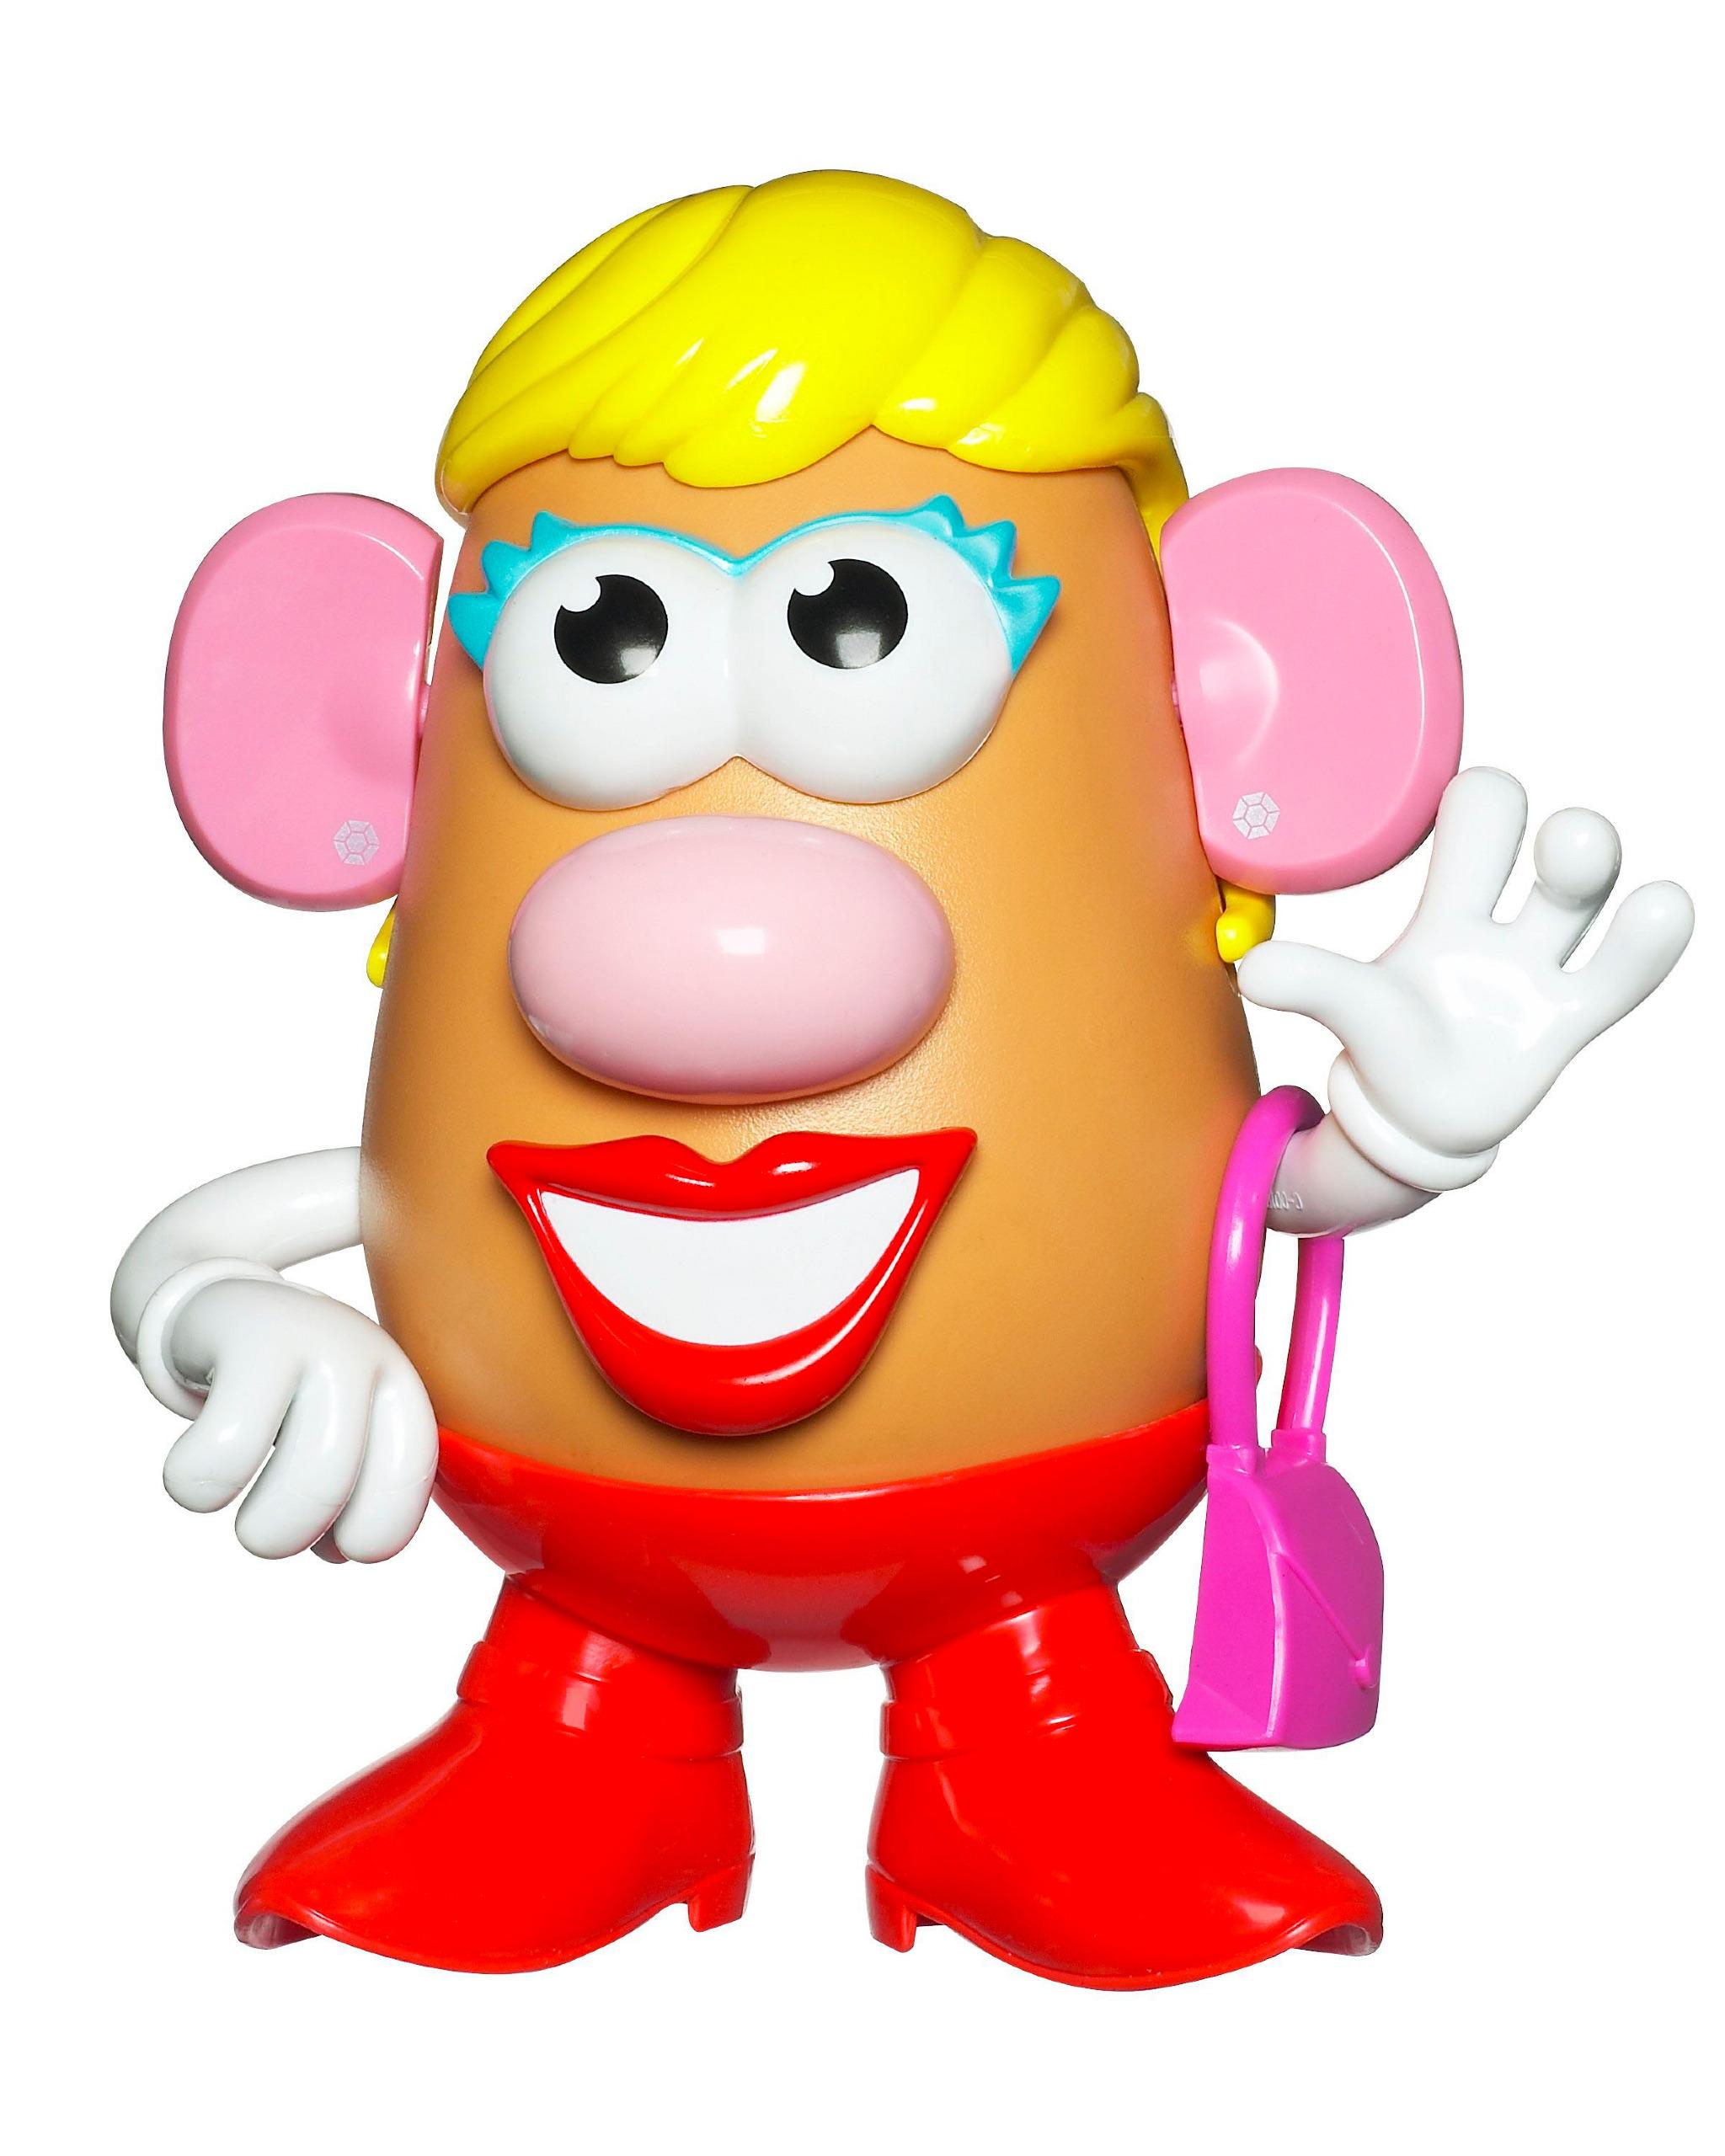 Mr-Mrs-Potato-Head-Hasbro-2.jpg